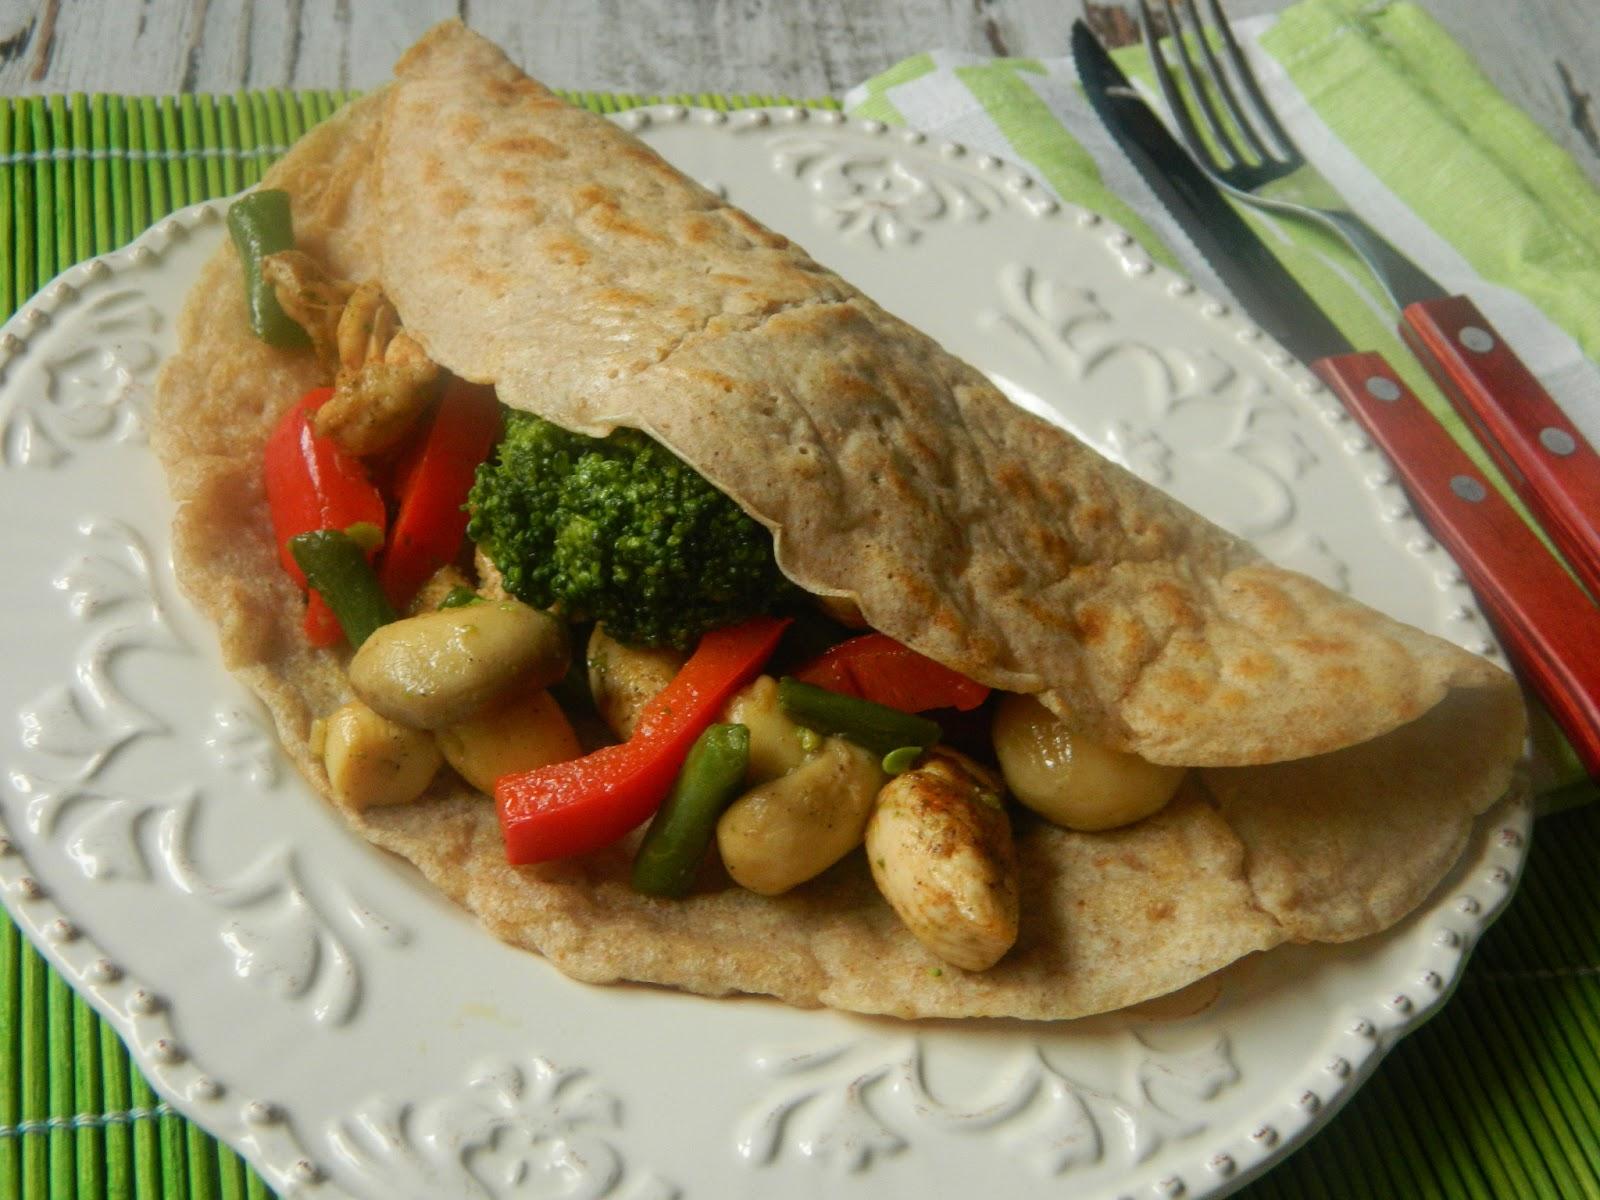 Clatite integrale cu legume picante si piept de pui